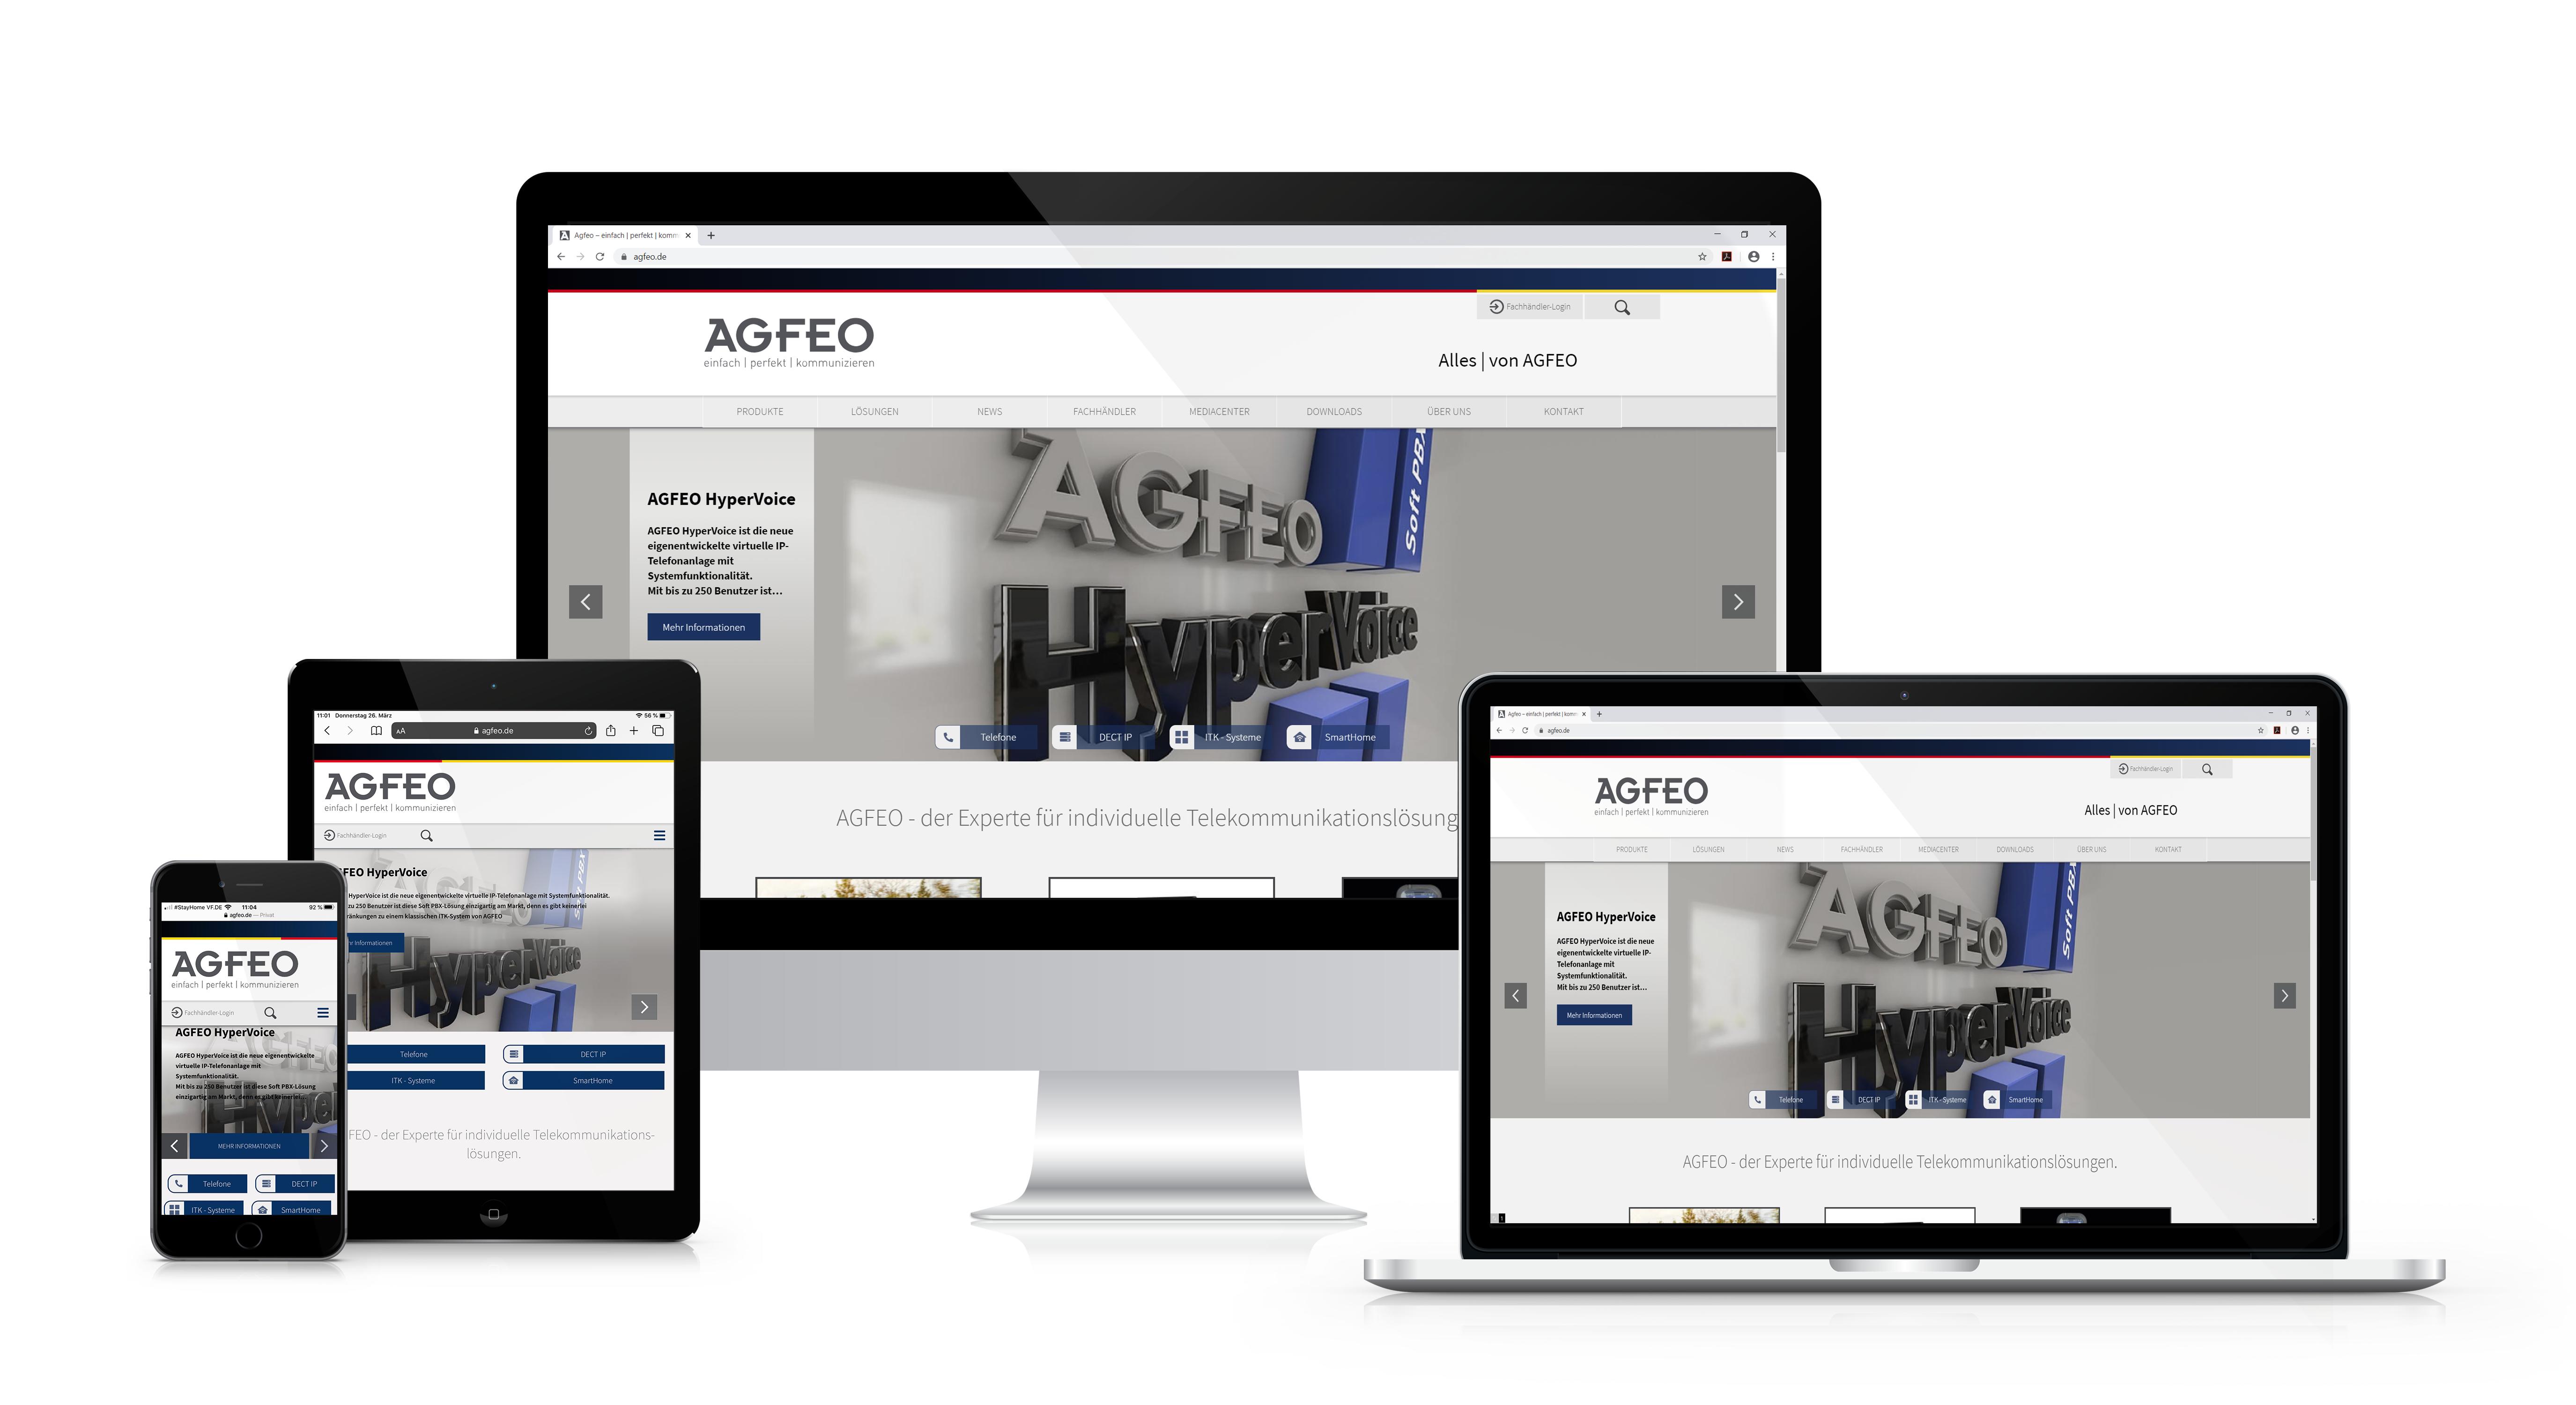 AGFEO Reponsive Design